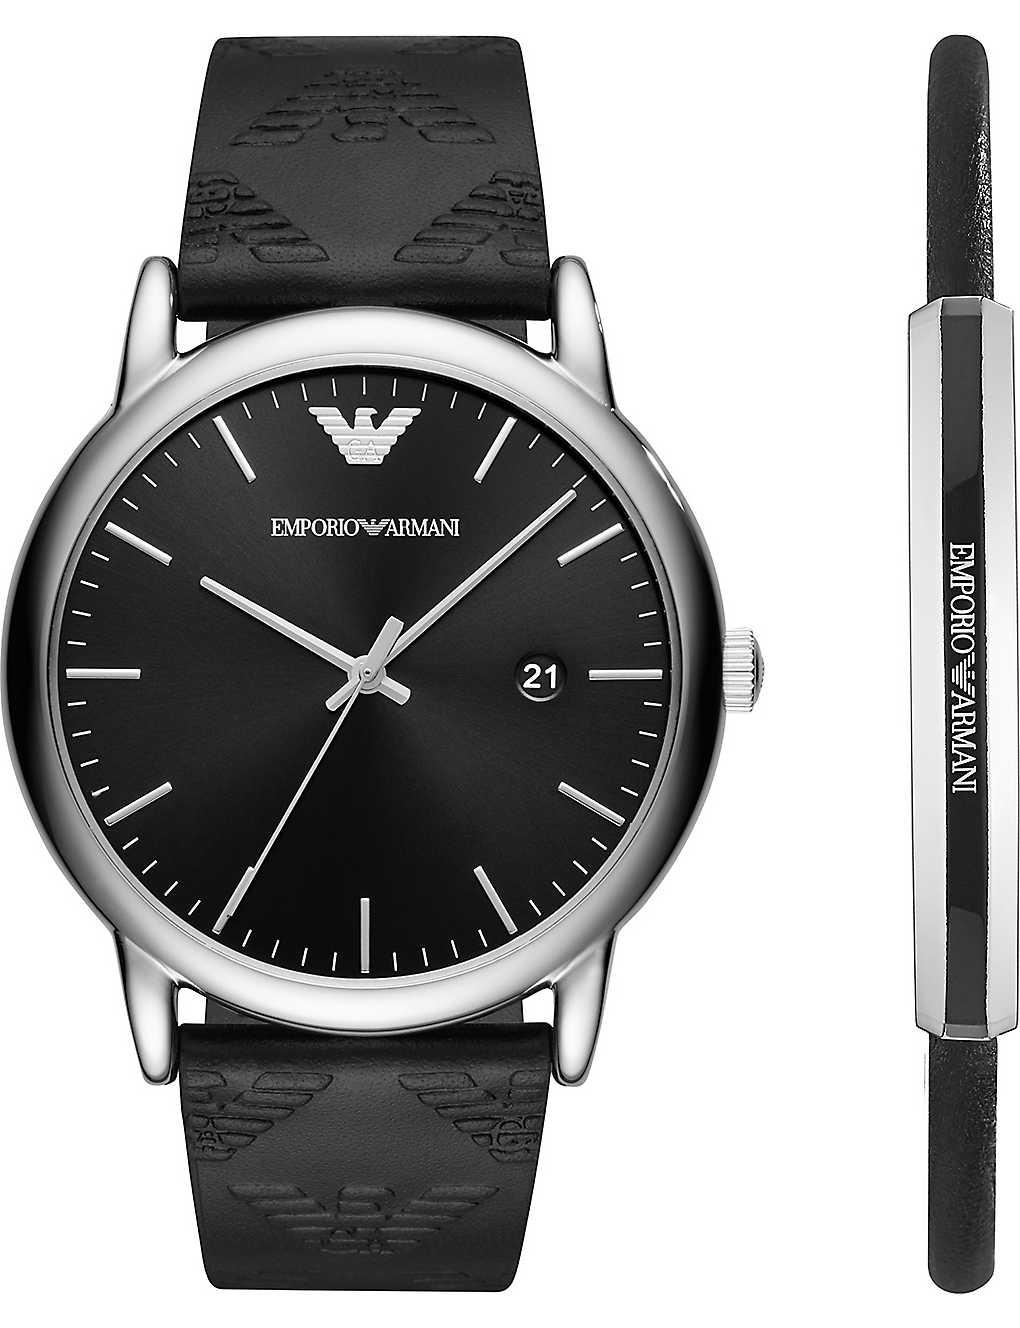 EMPORIO ARMANI - AR80012 Luigi stainless steel quartz watch gift set ... a363cdfb73cb8